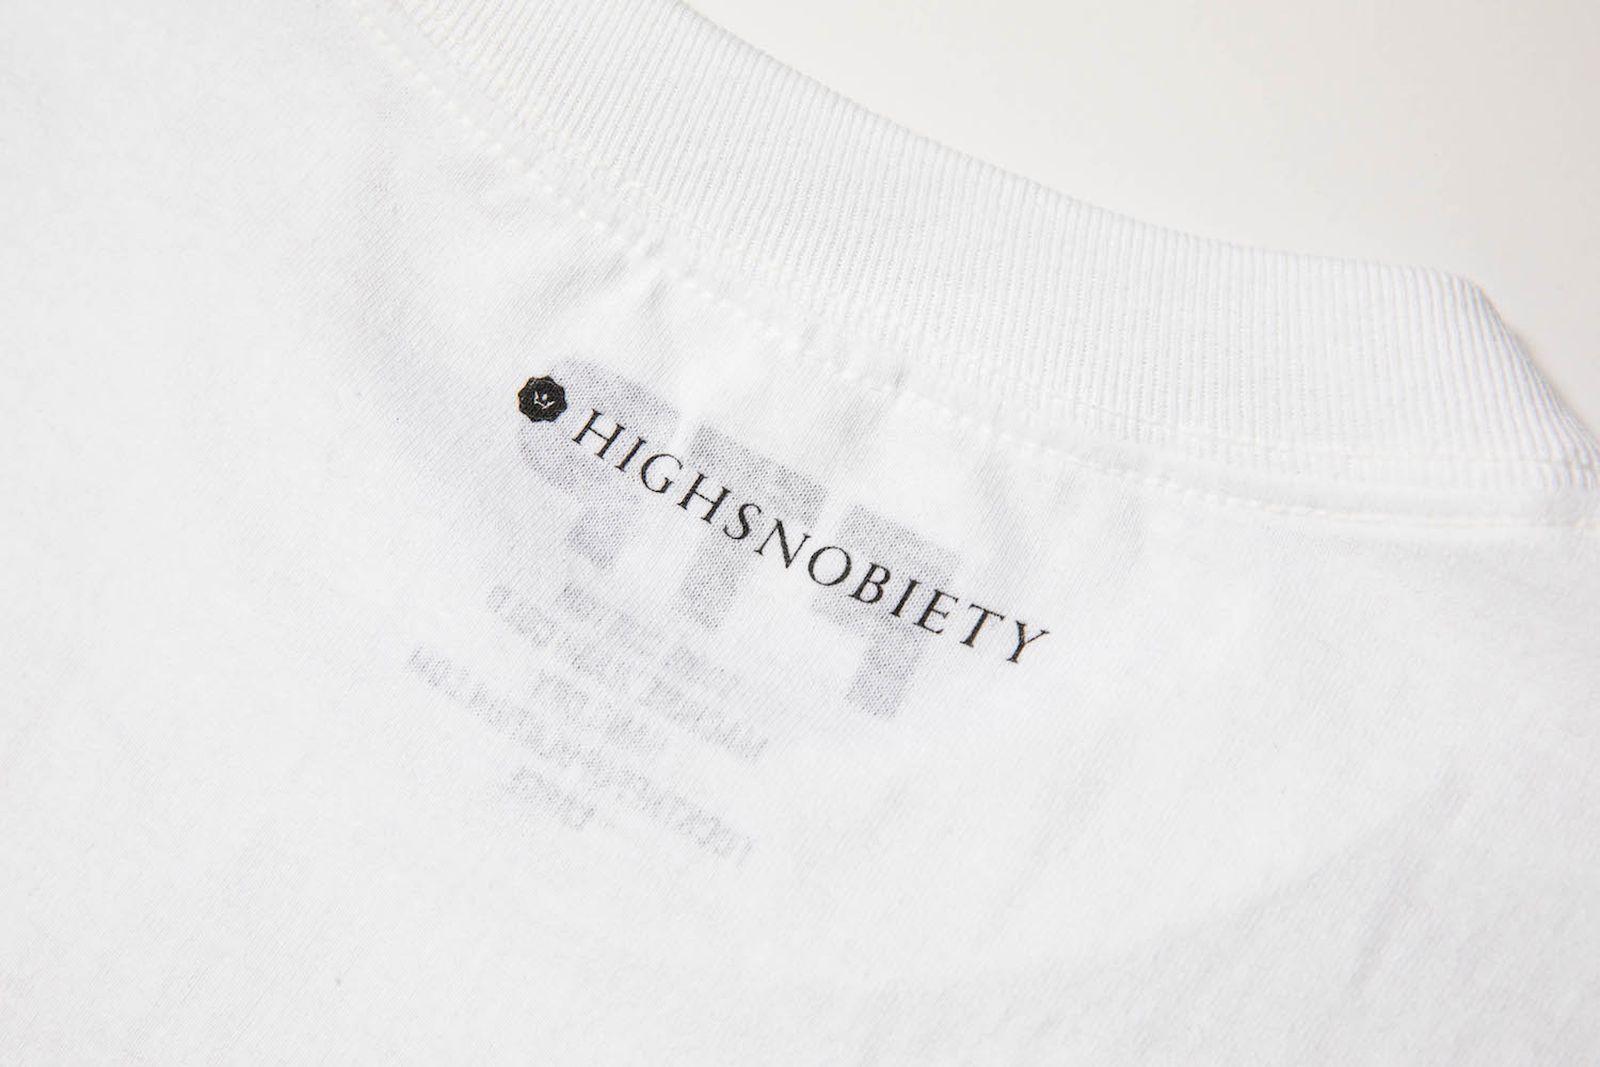 ftp-highsnobiety-tee-04